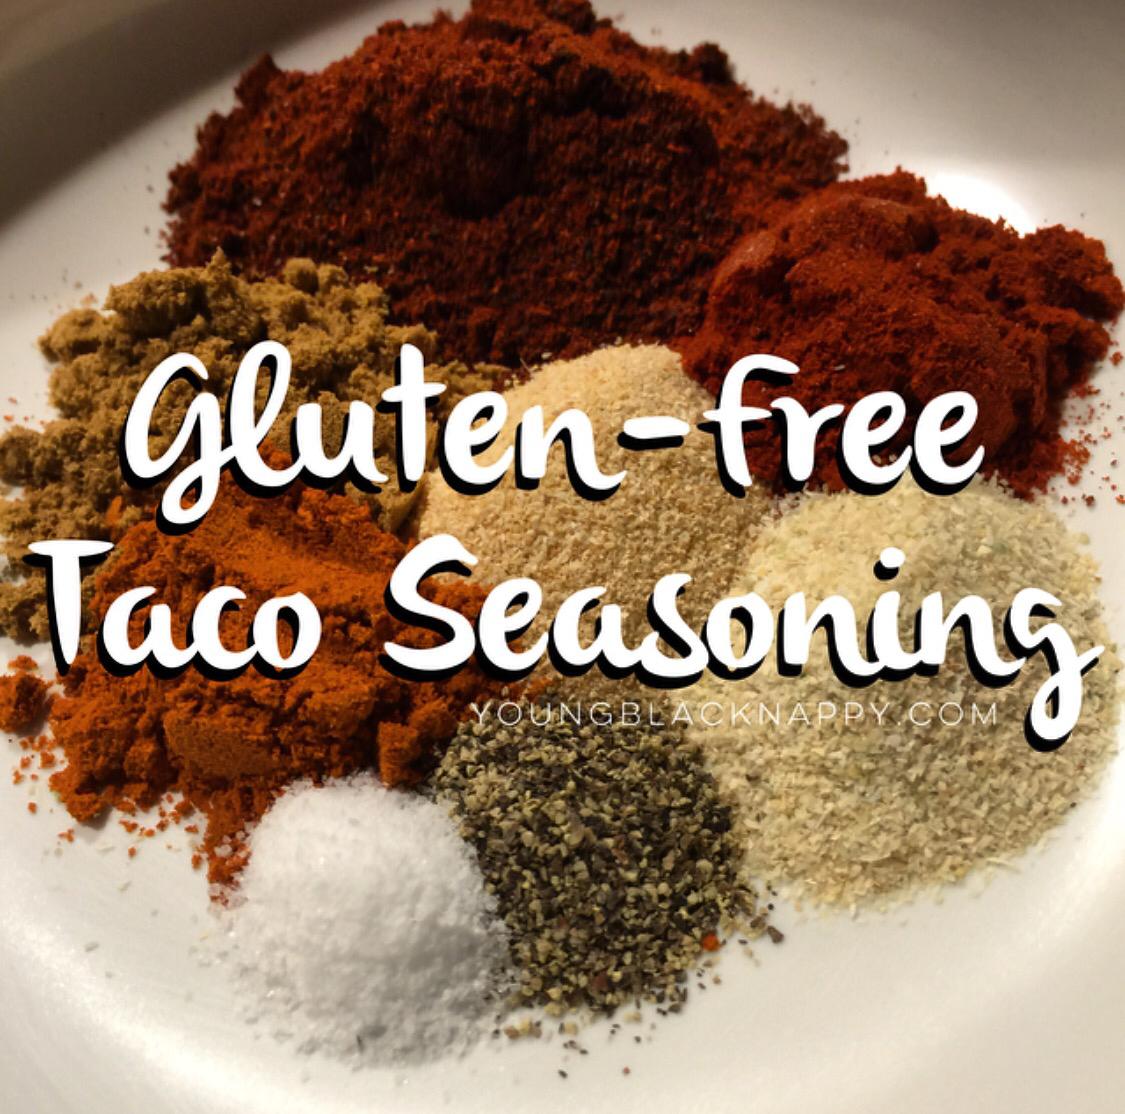 #ybnHealth: Gluten-Free Taco Seasoning Recipe | young.black.nappy.